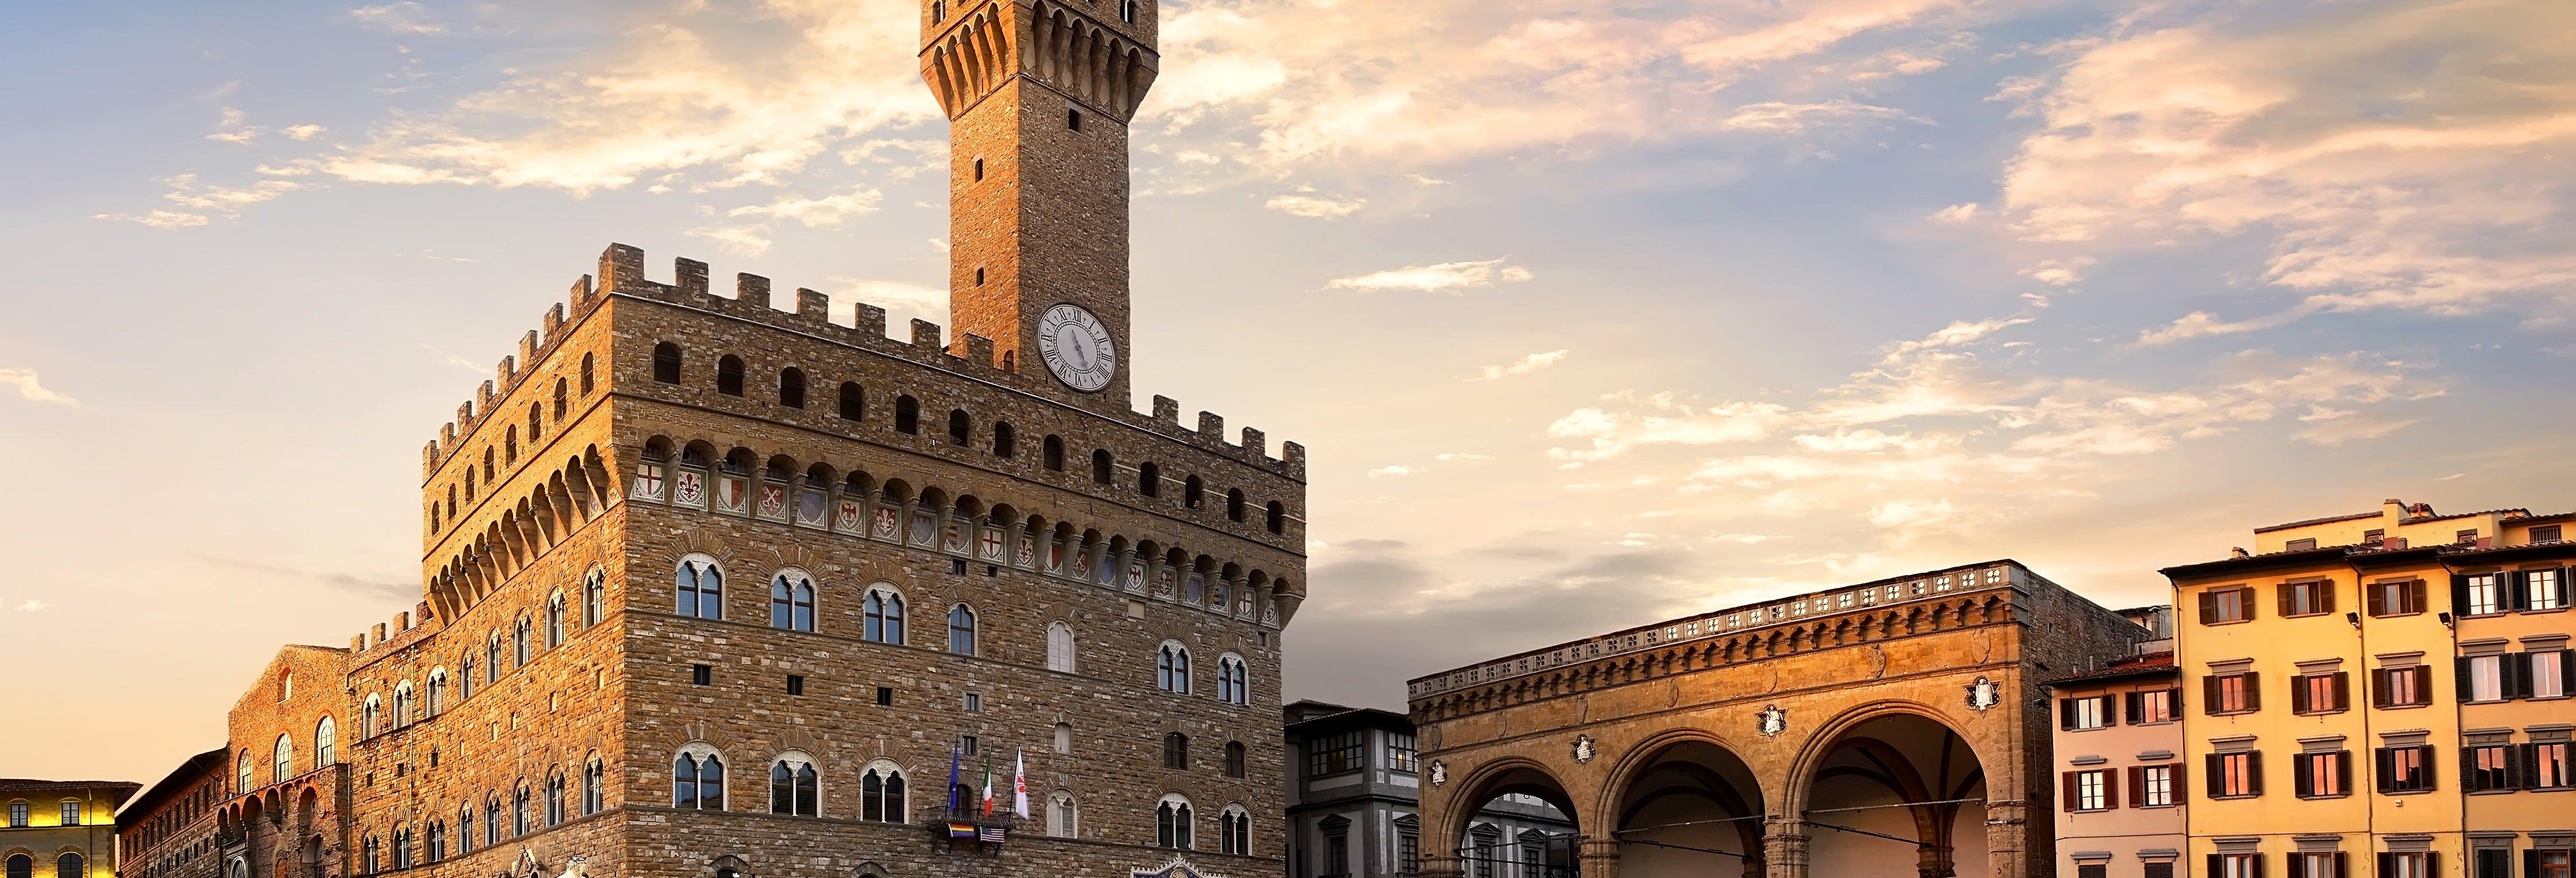 Visite du Palazzo Vecchio